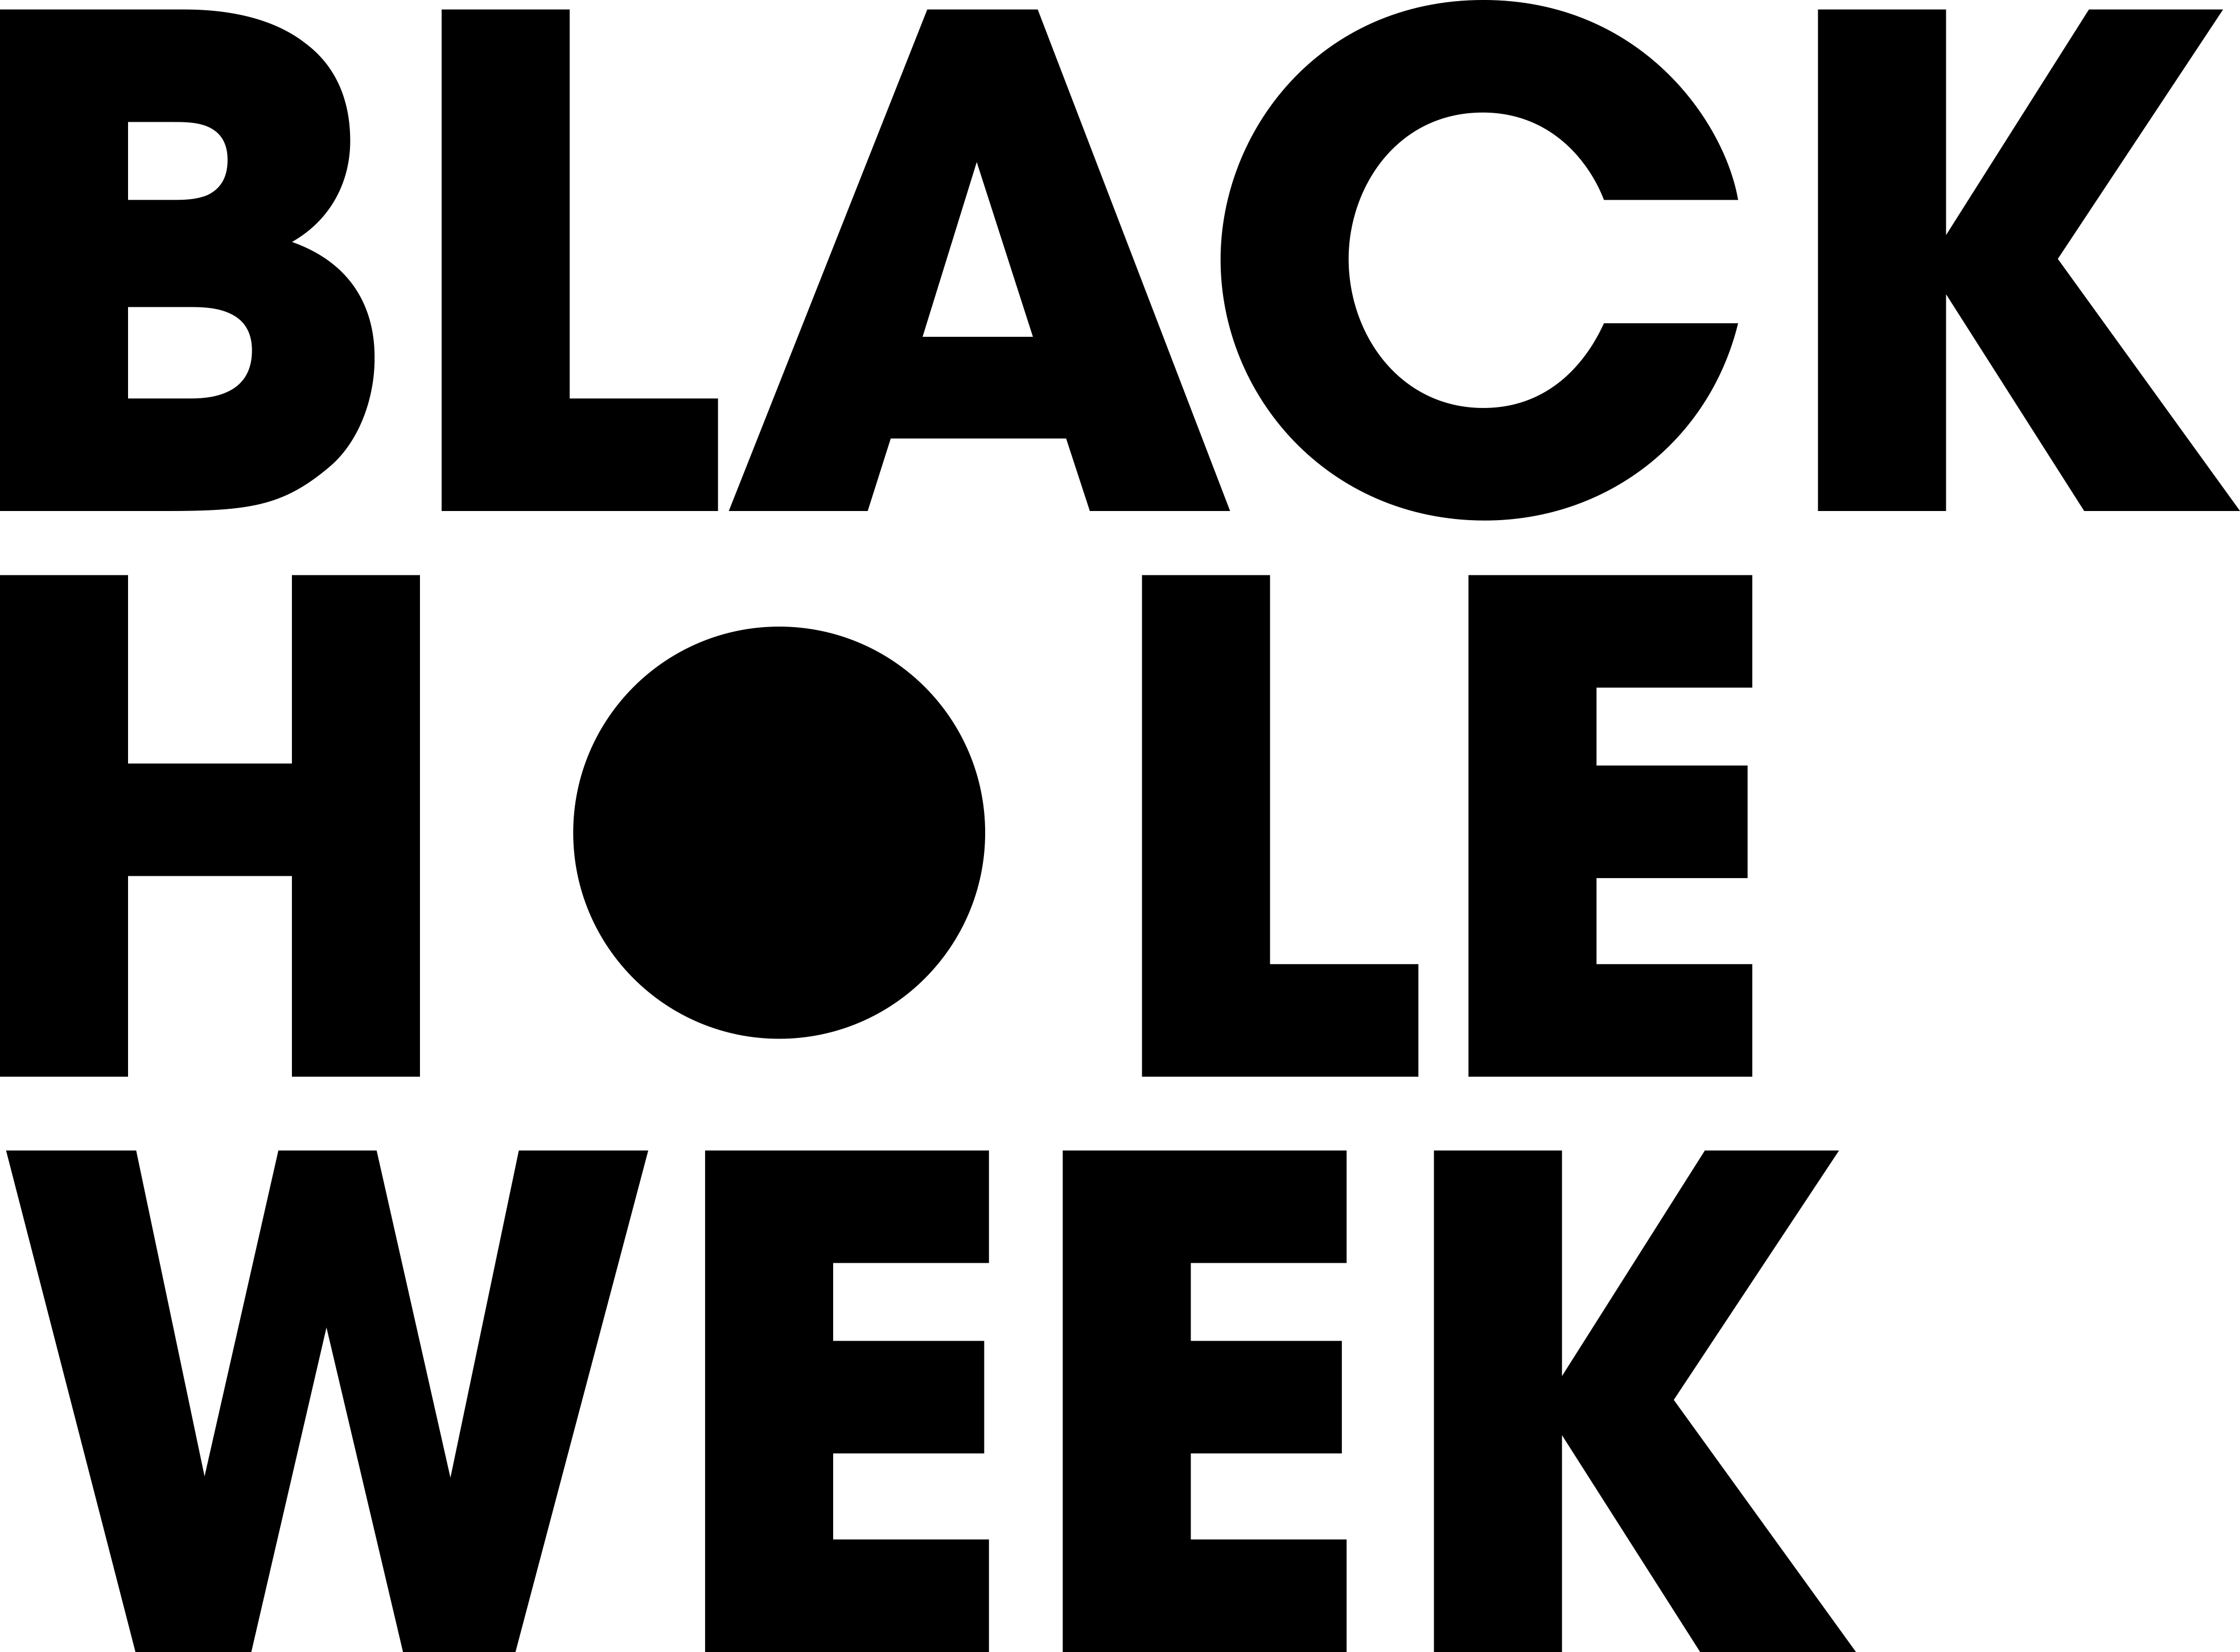 Logo der Black Hole Week